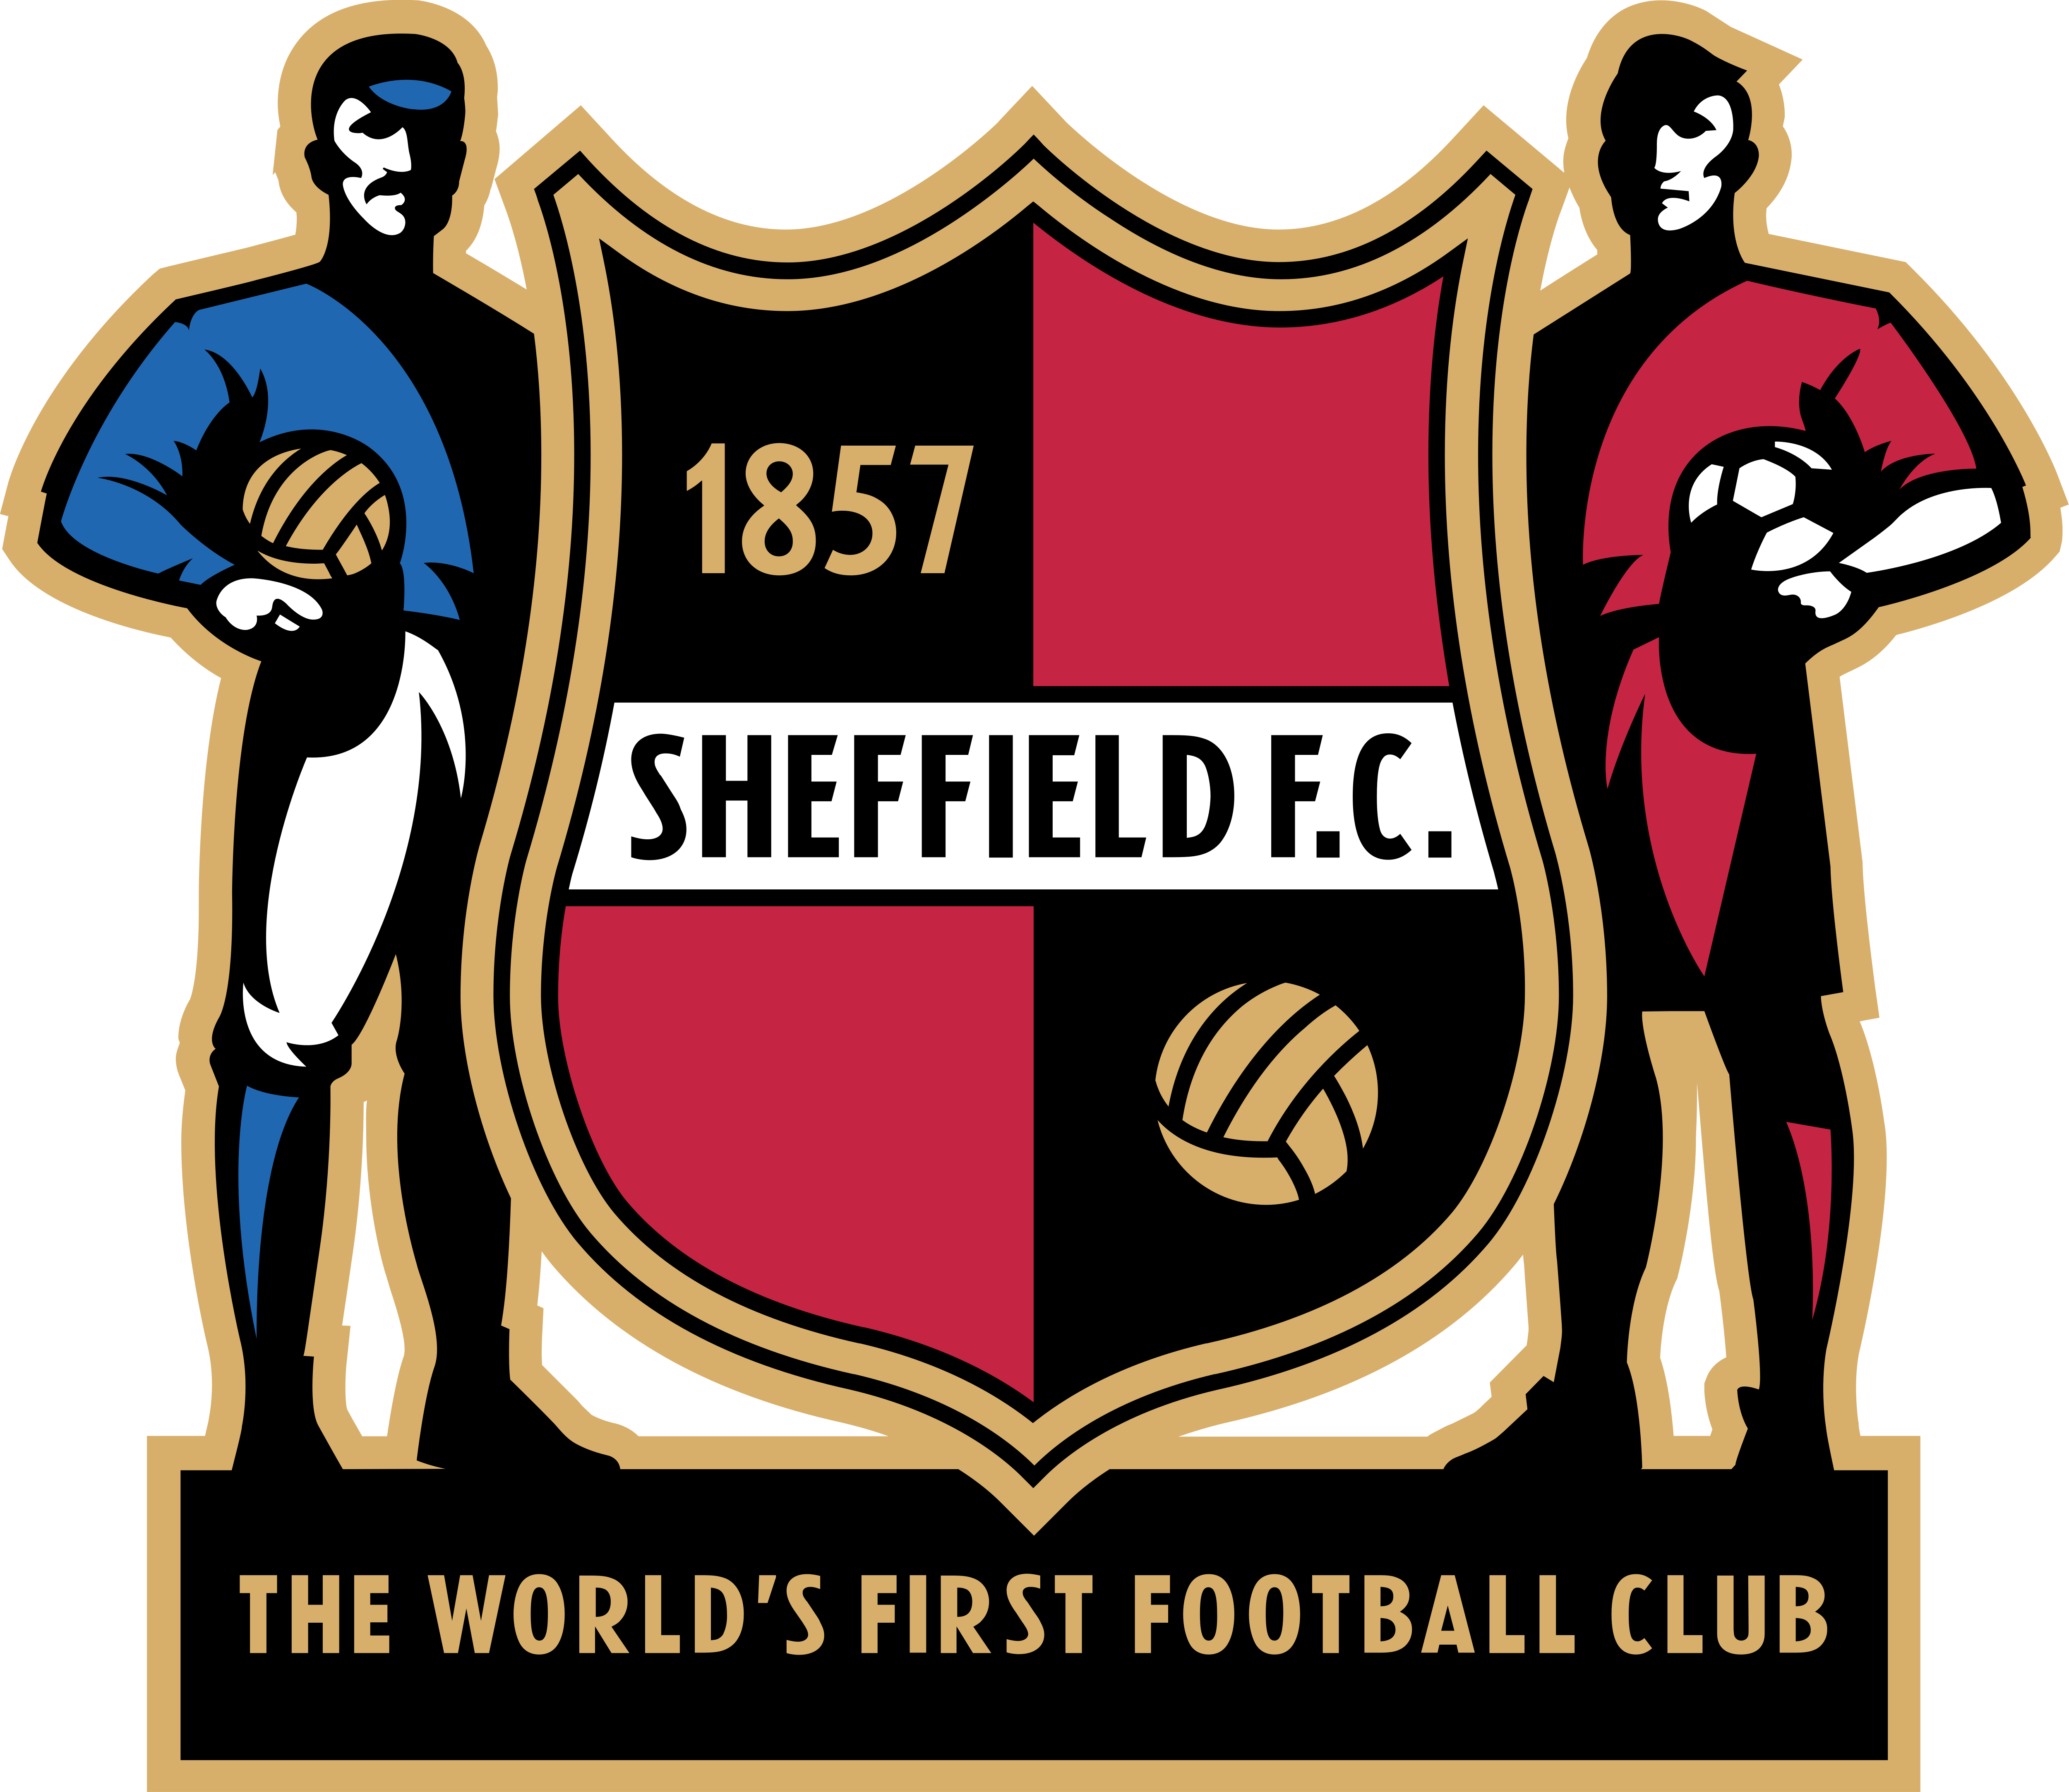 sheffield fc � logos download